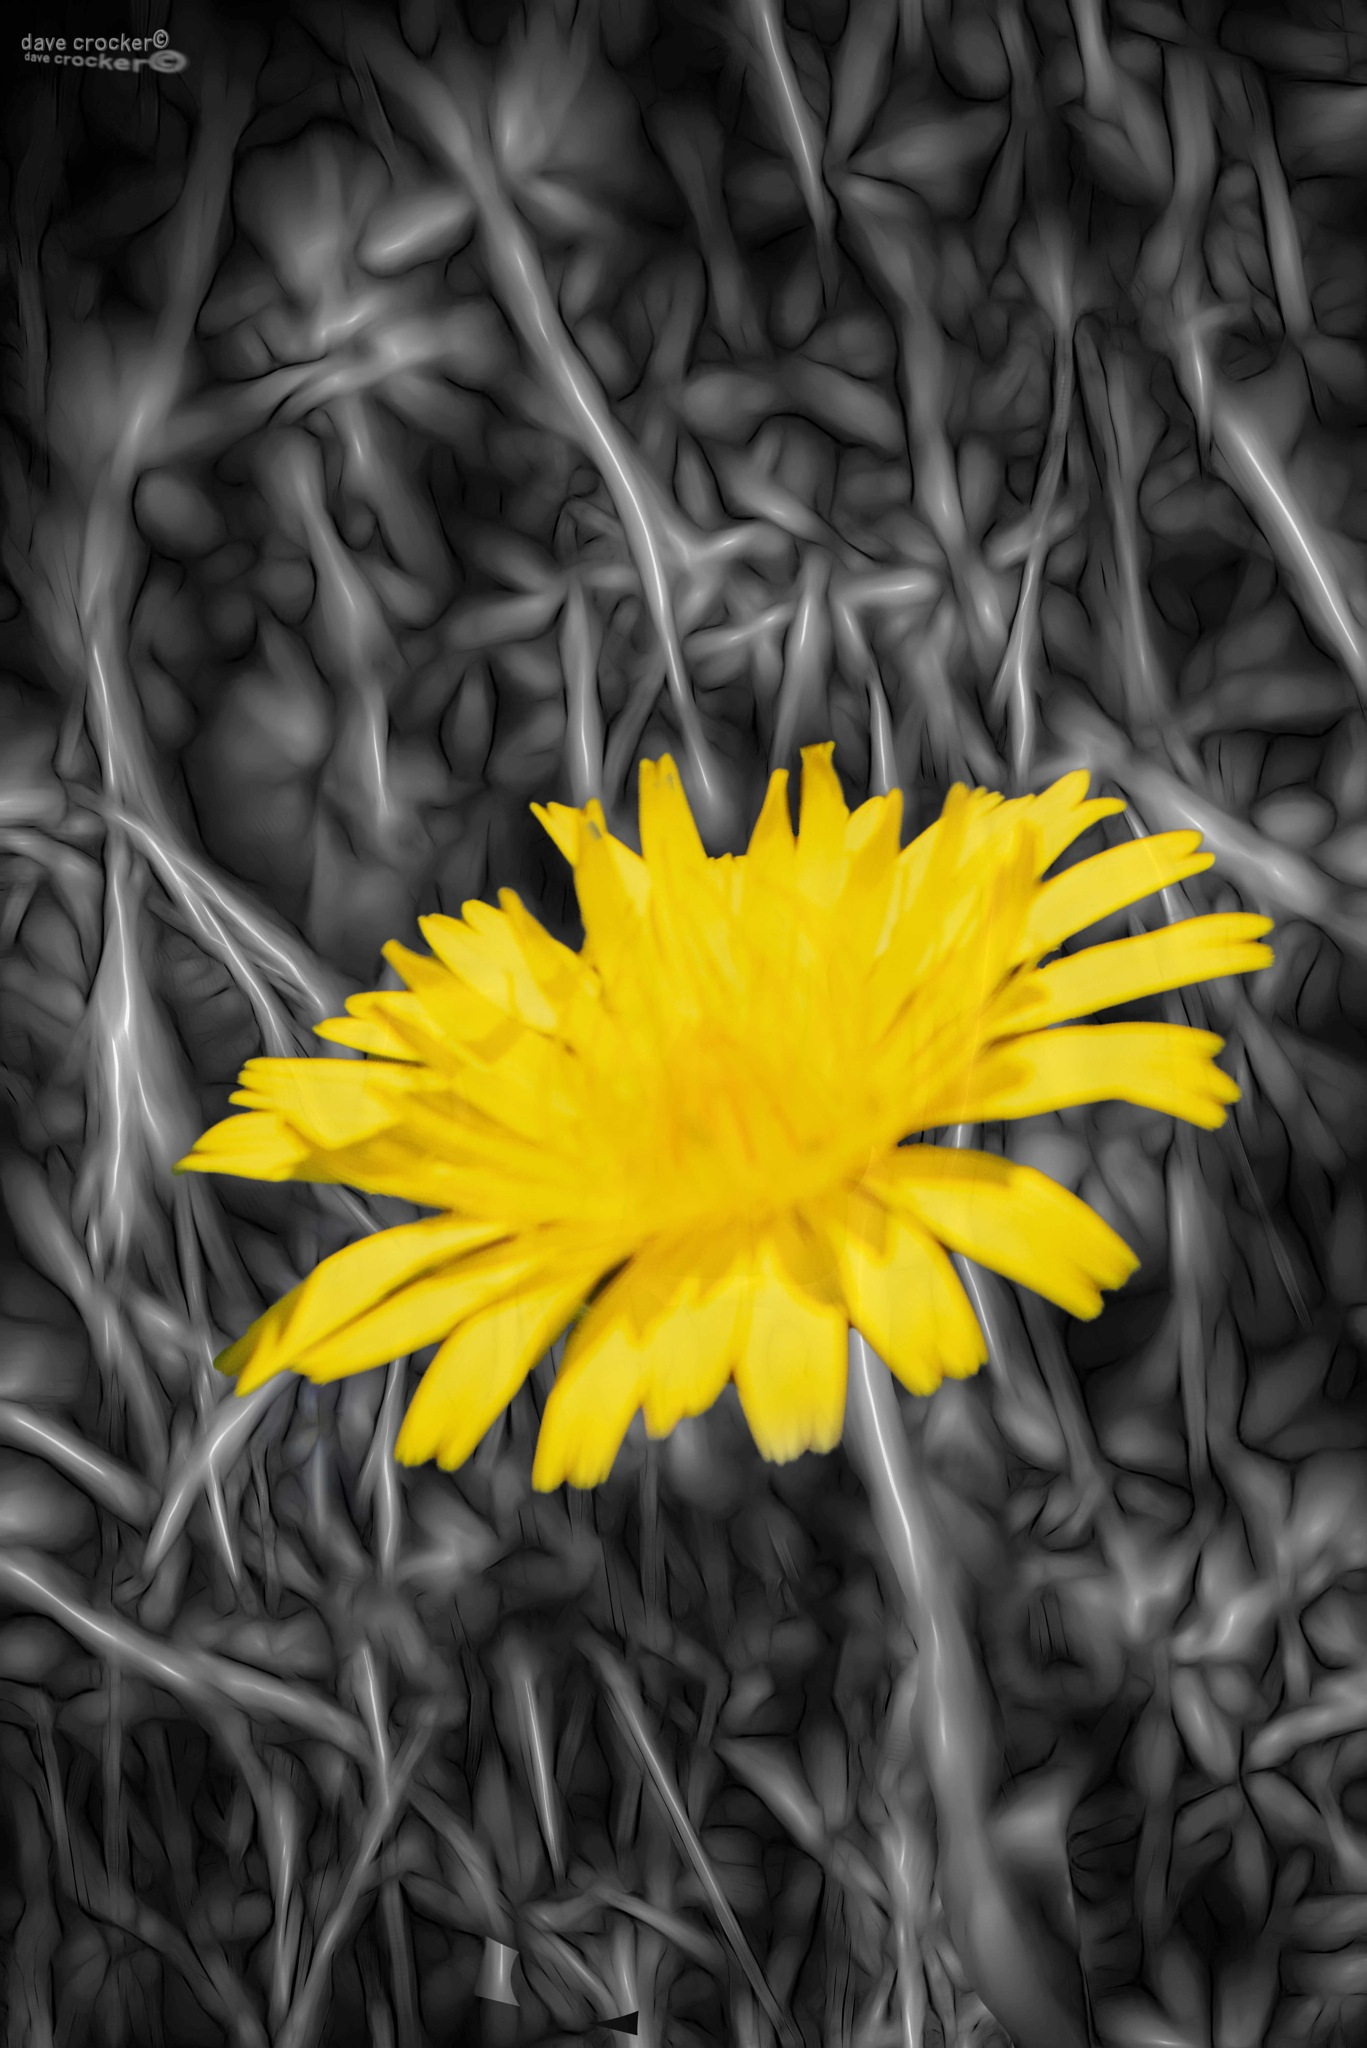 Fleur Jaune by Lightpimp - akadodjer